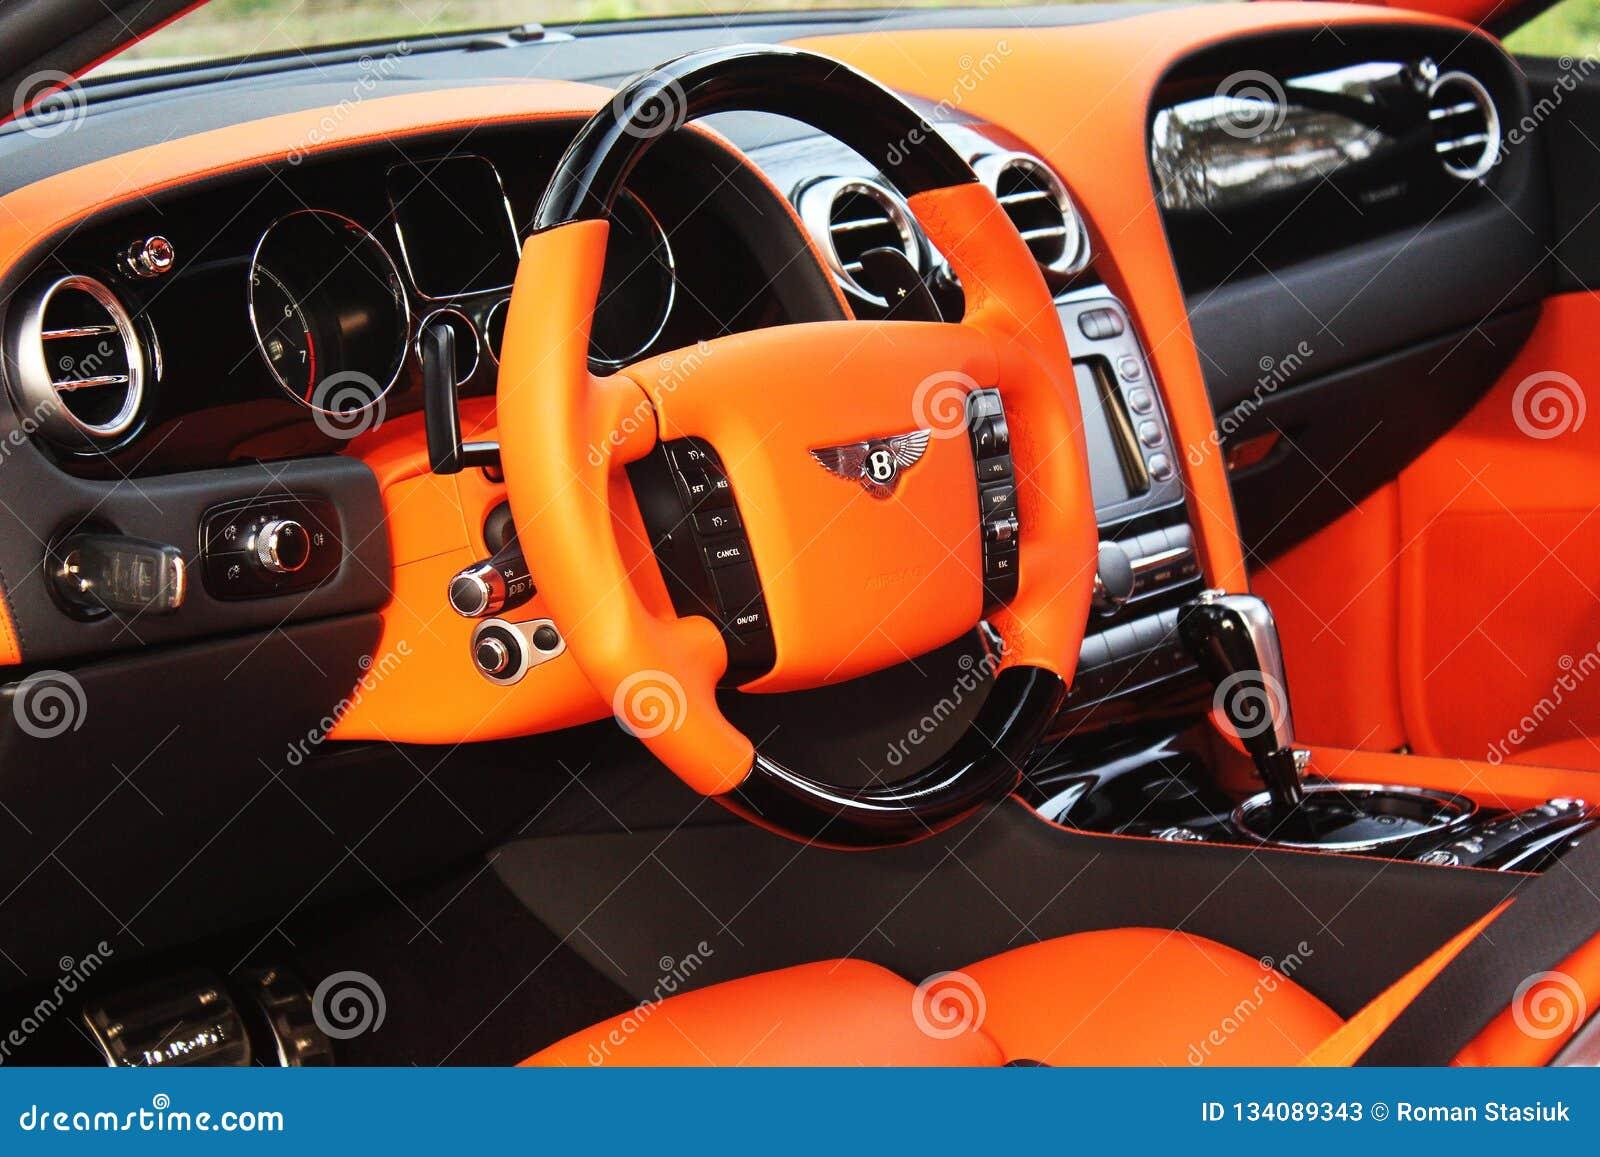 Kiev Ukraine April 20 2014 Salon Bentley Continental Gt Le Mansory Orange Editorial Stock Photo Image Of Continental Luxury 134089343